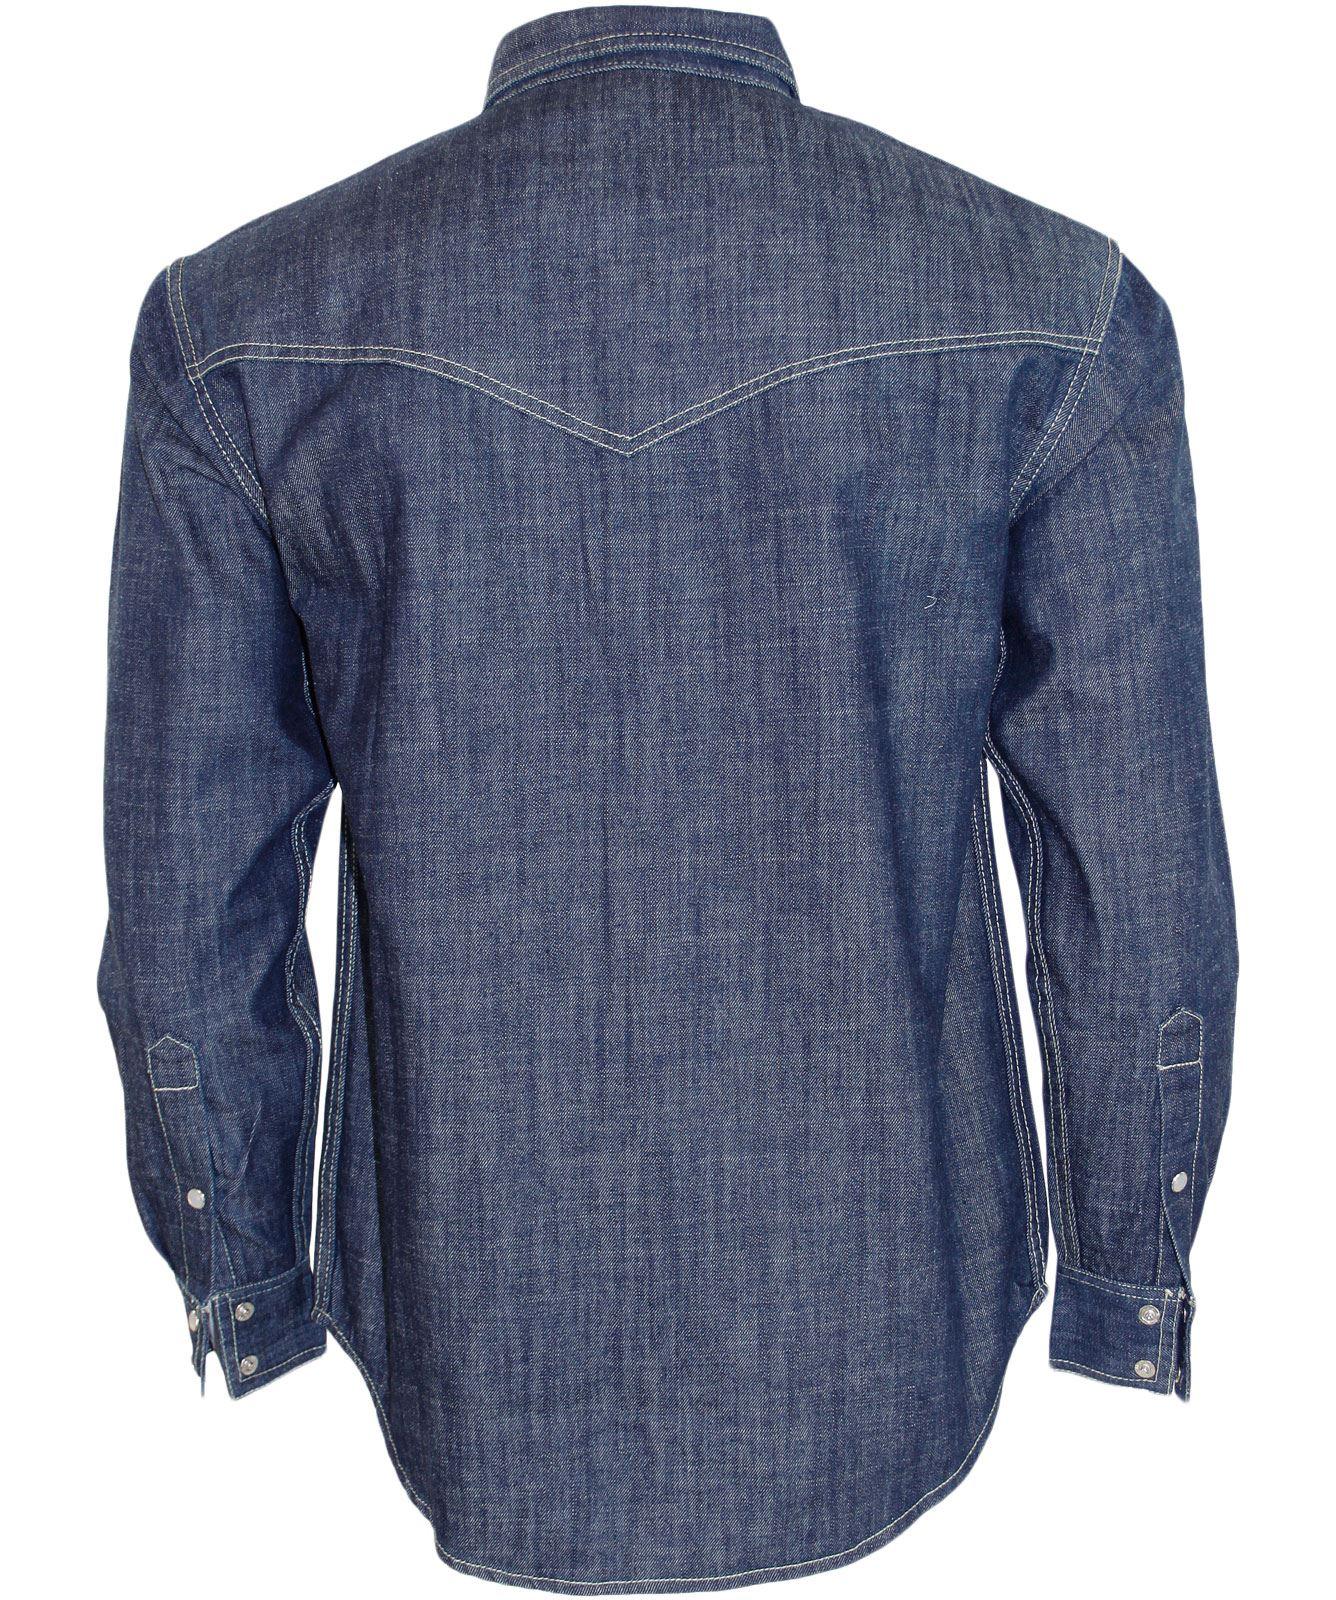 Best Men Denim Shirt Double Chest Pocket Long Sleeve Collar Cotton